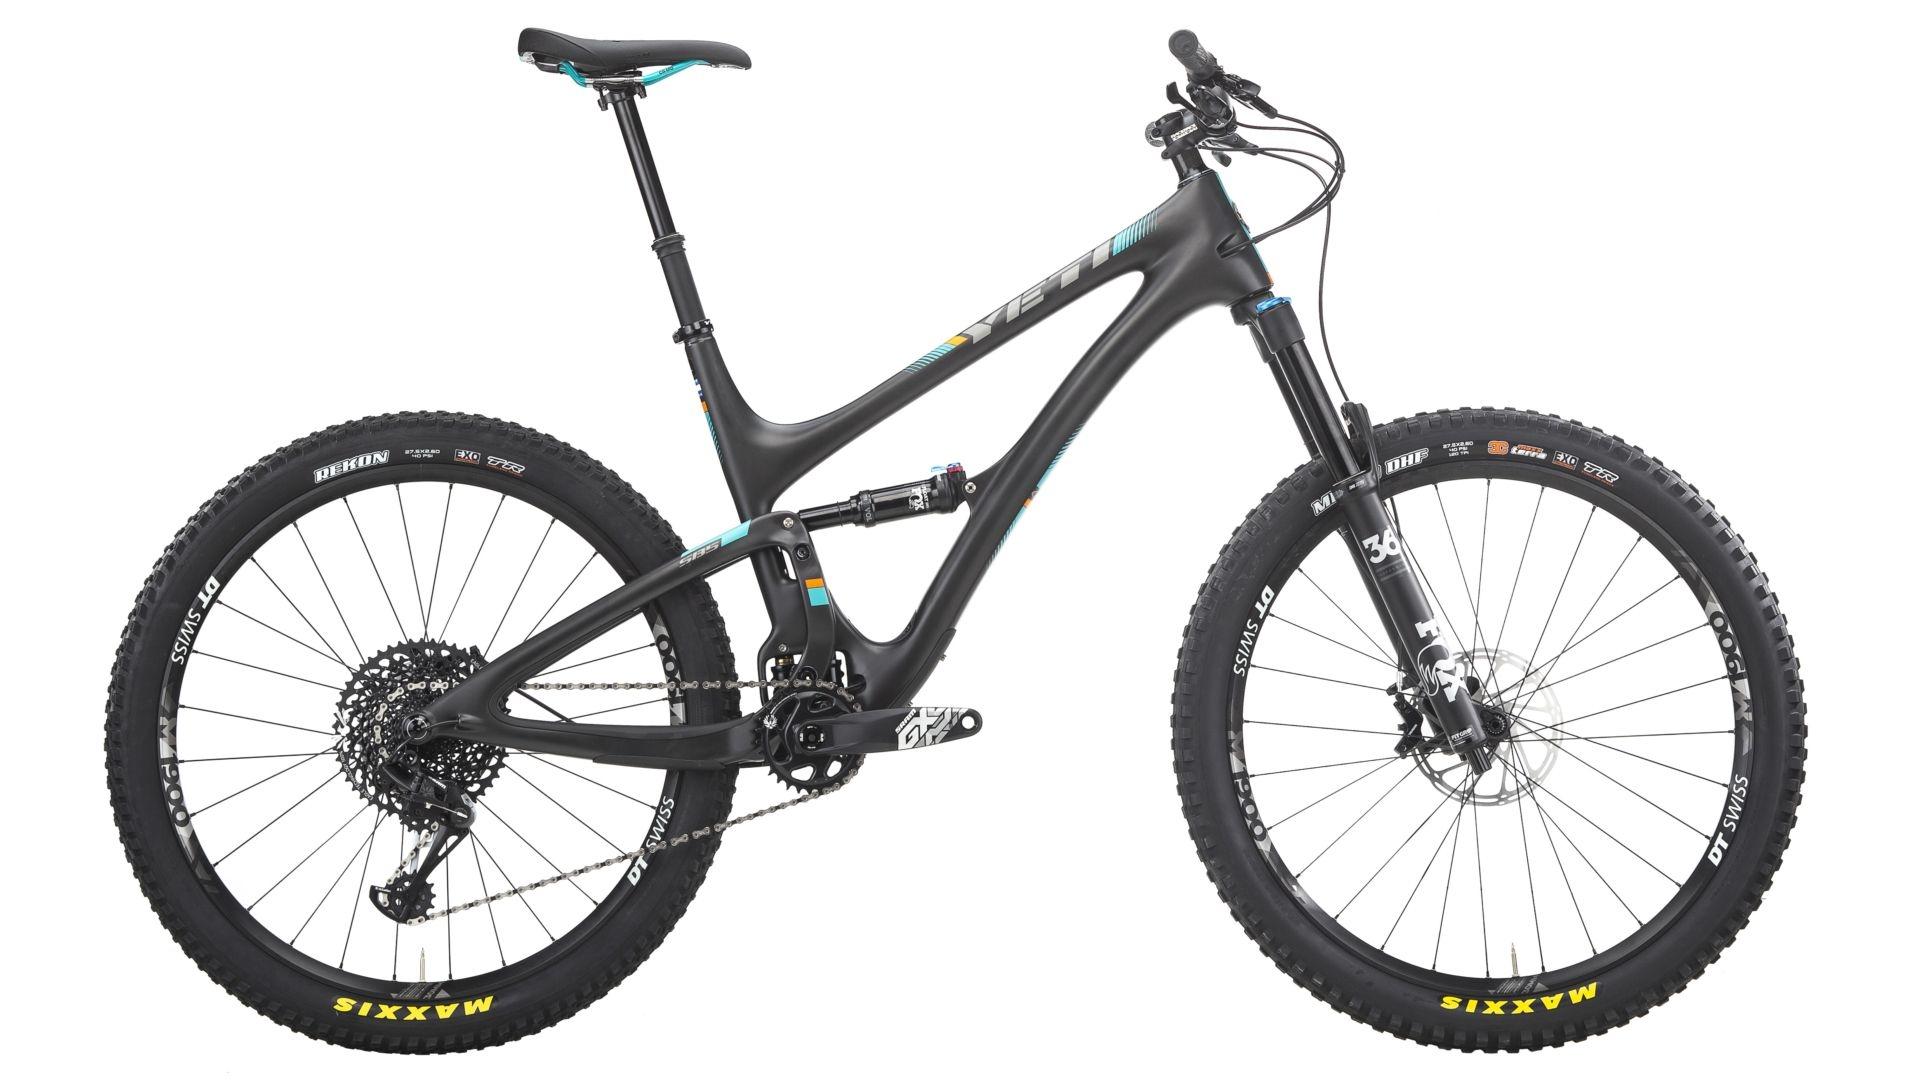 yeti-sb5-carbon-gx-eagle-crested-butte-bike-rental